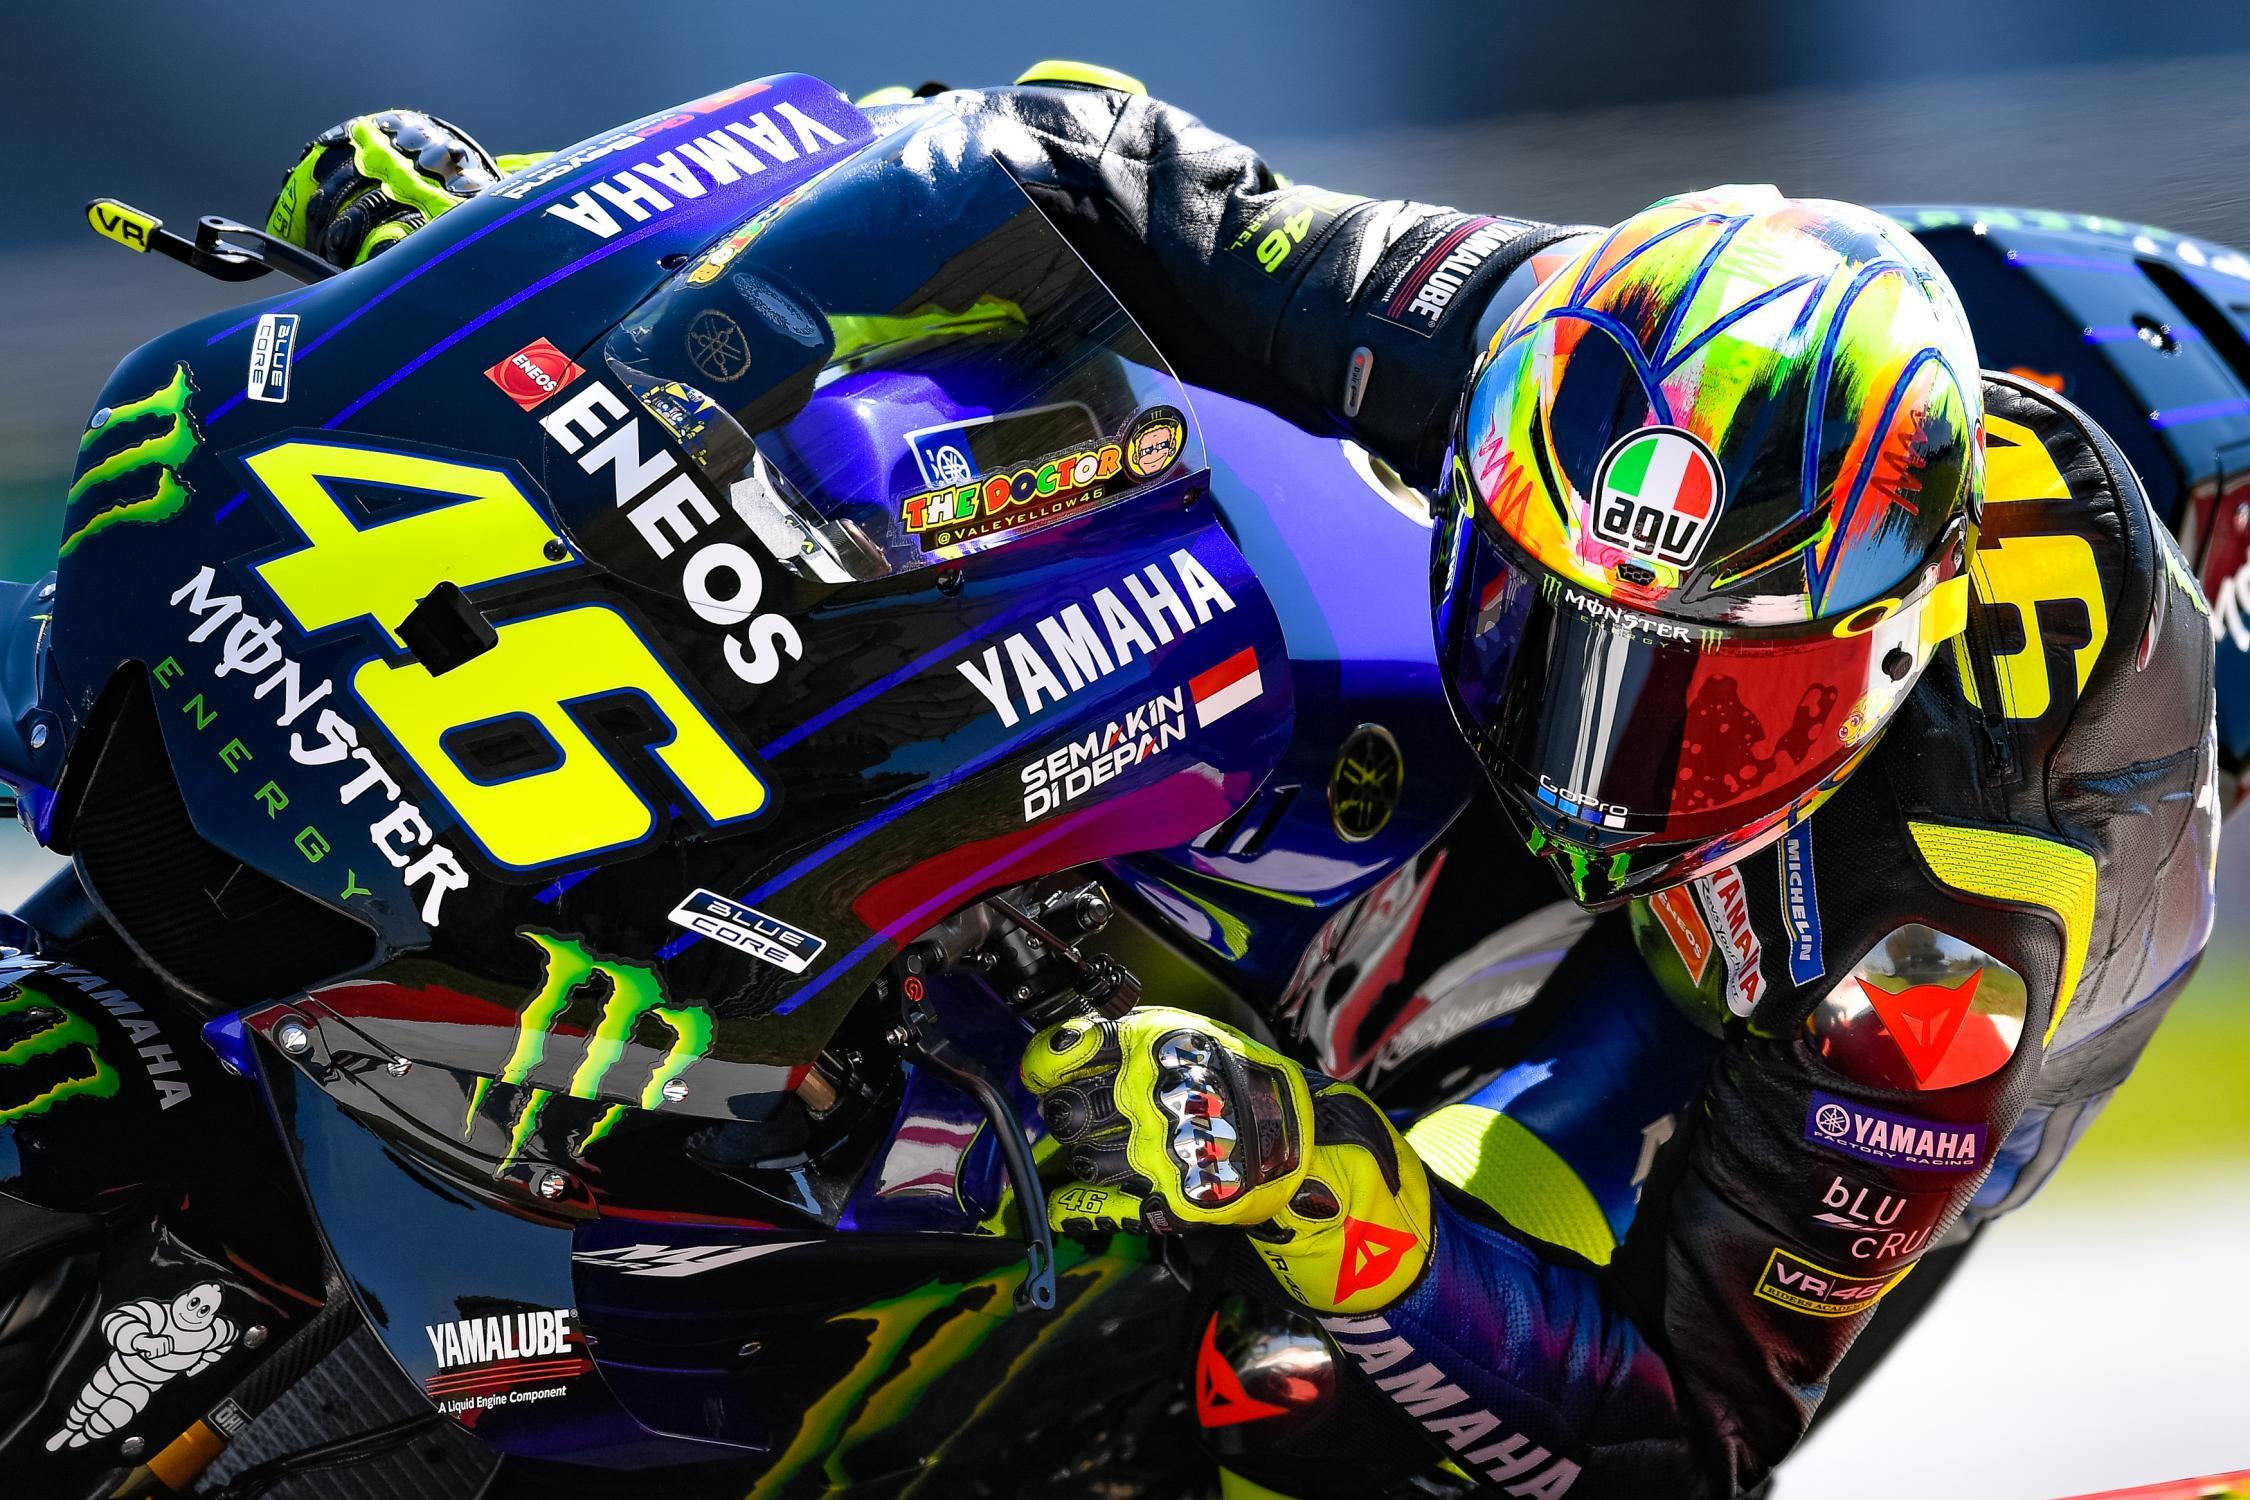 MOTO GP TESTS 2019 - Page 2 Valentino-rossi-sepang-test-motogp-j1-2019-2